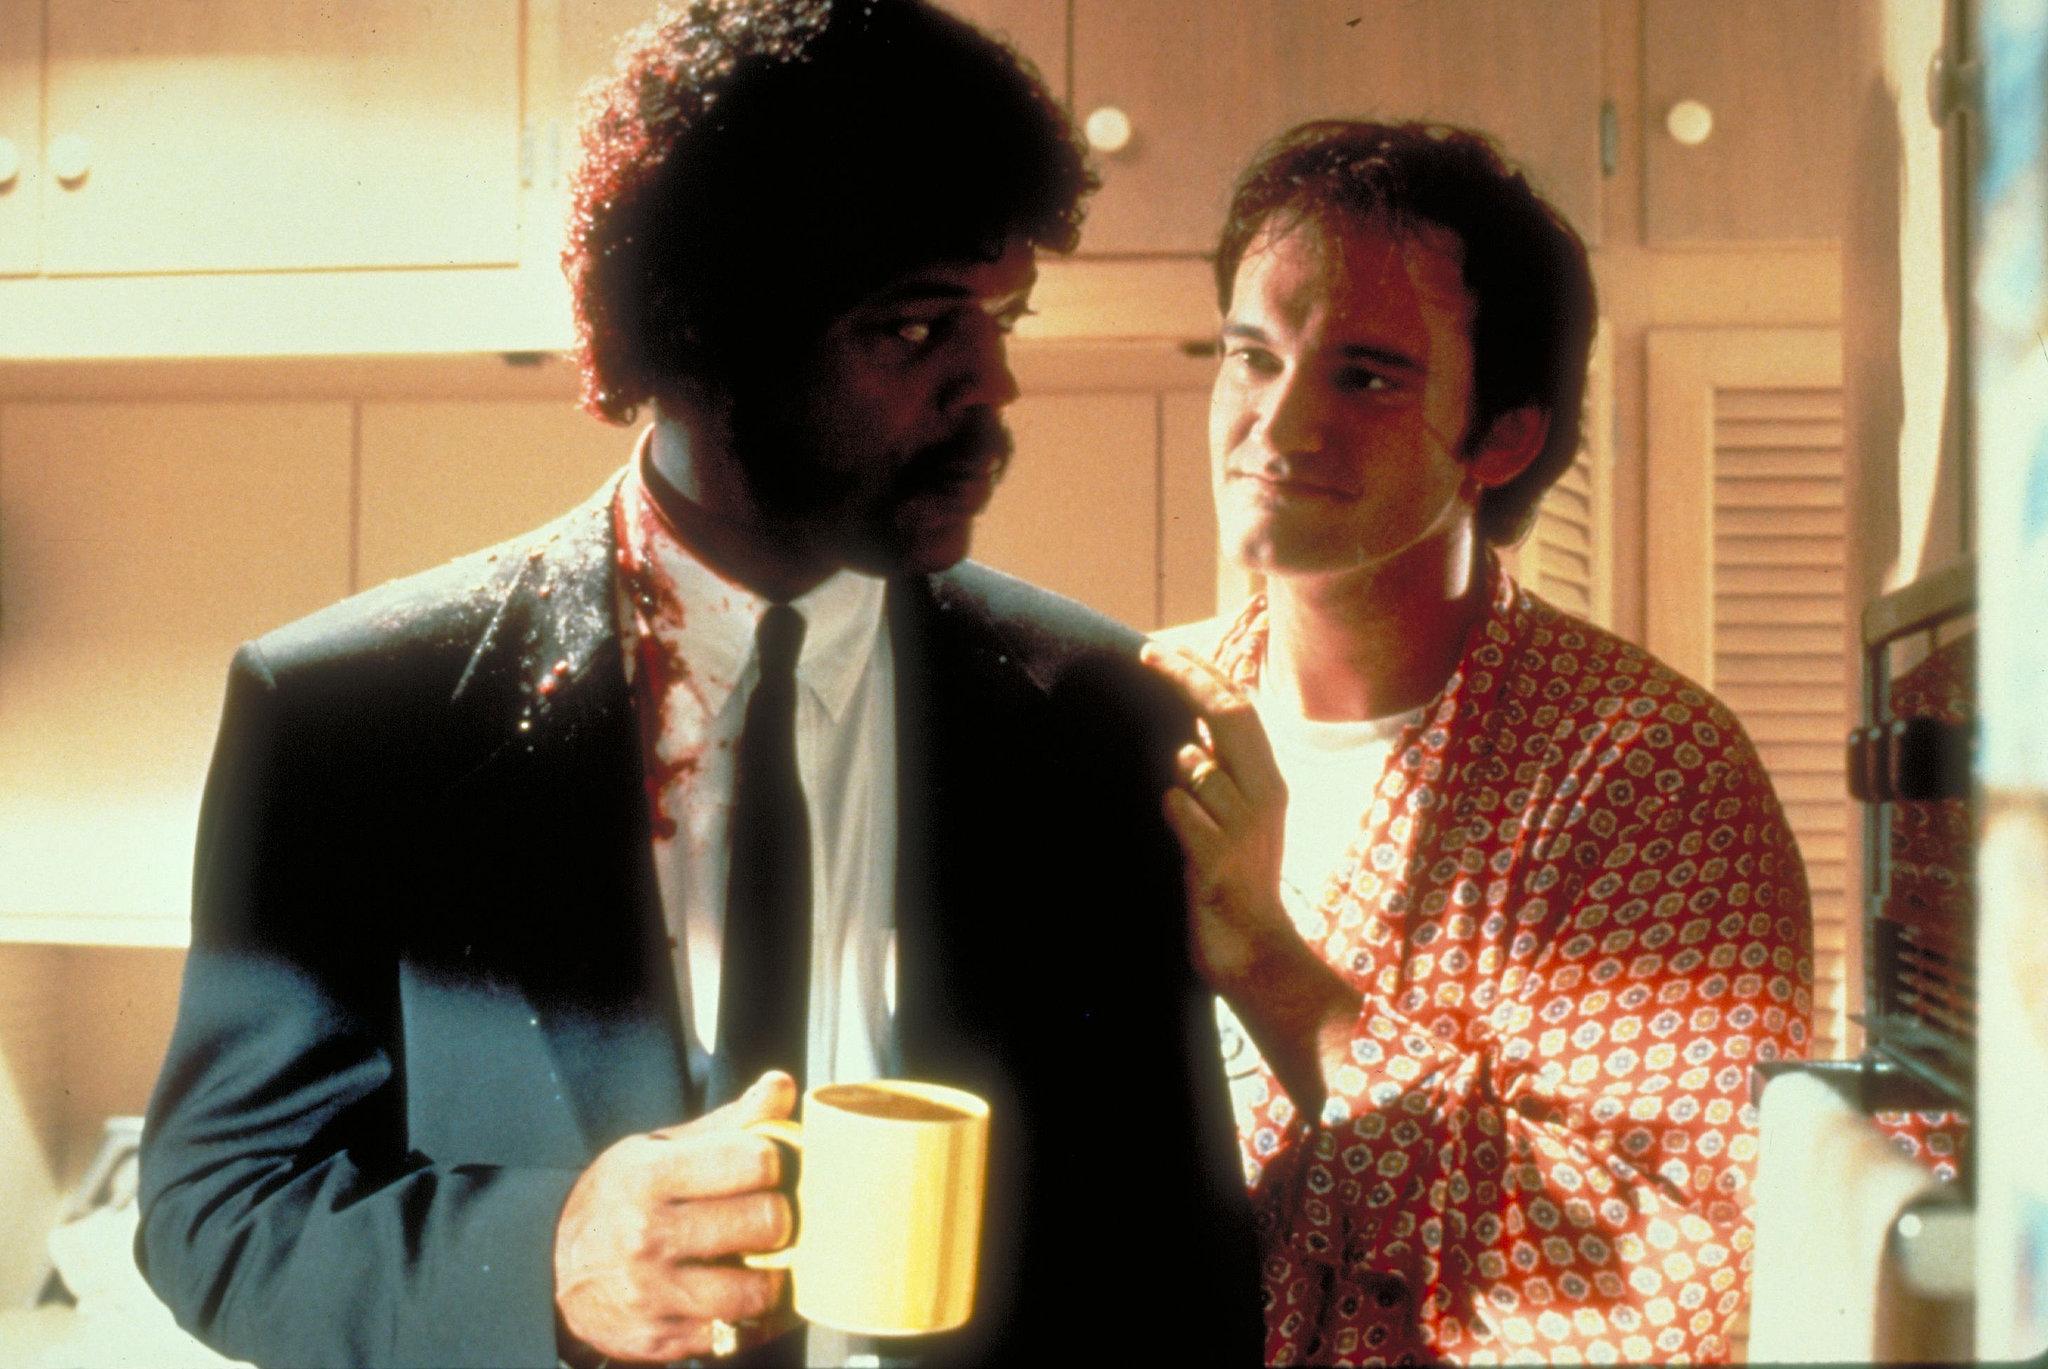 http://media4.popsugar-assets.com/files/2013/07/07/834/n/1922283/9c08cfb8caeb3337_url-12v0uHJf.xxxlarge_2x/i/Quentin-Tarantino-Samuel-L-Jackson.jpg